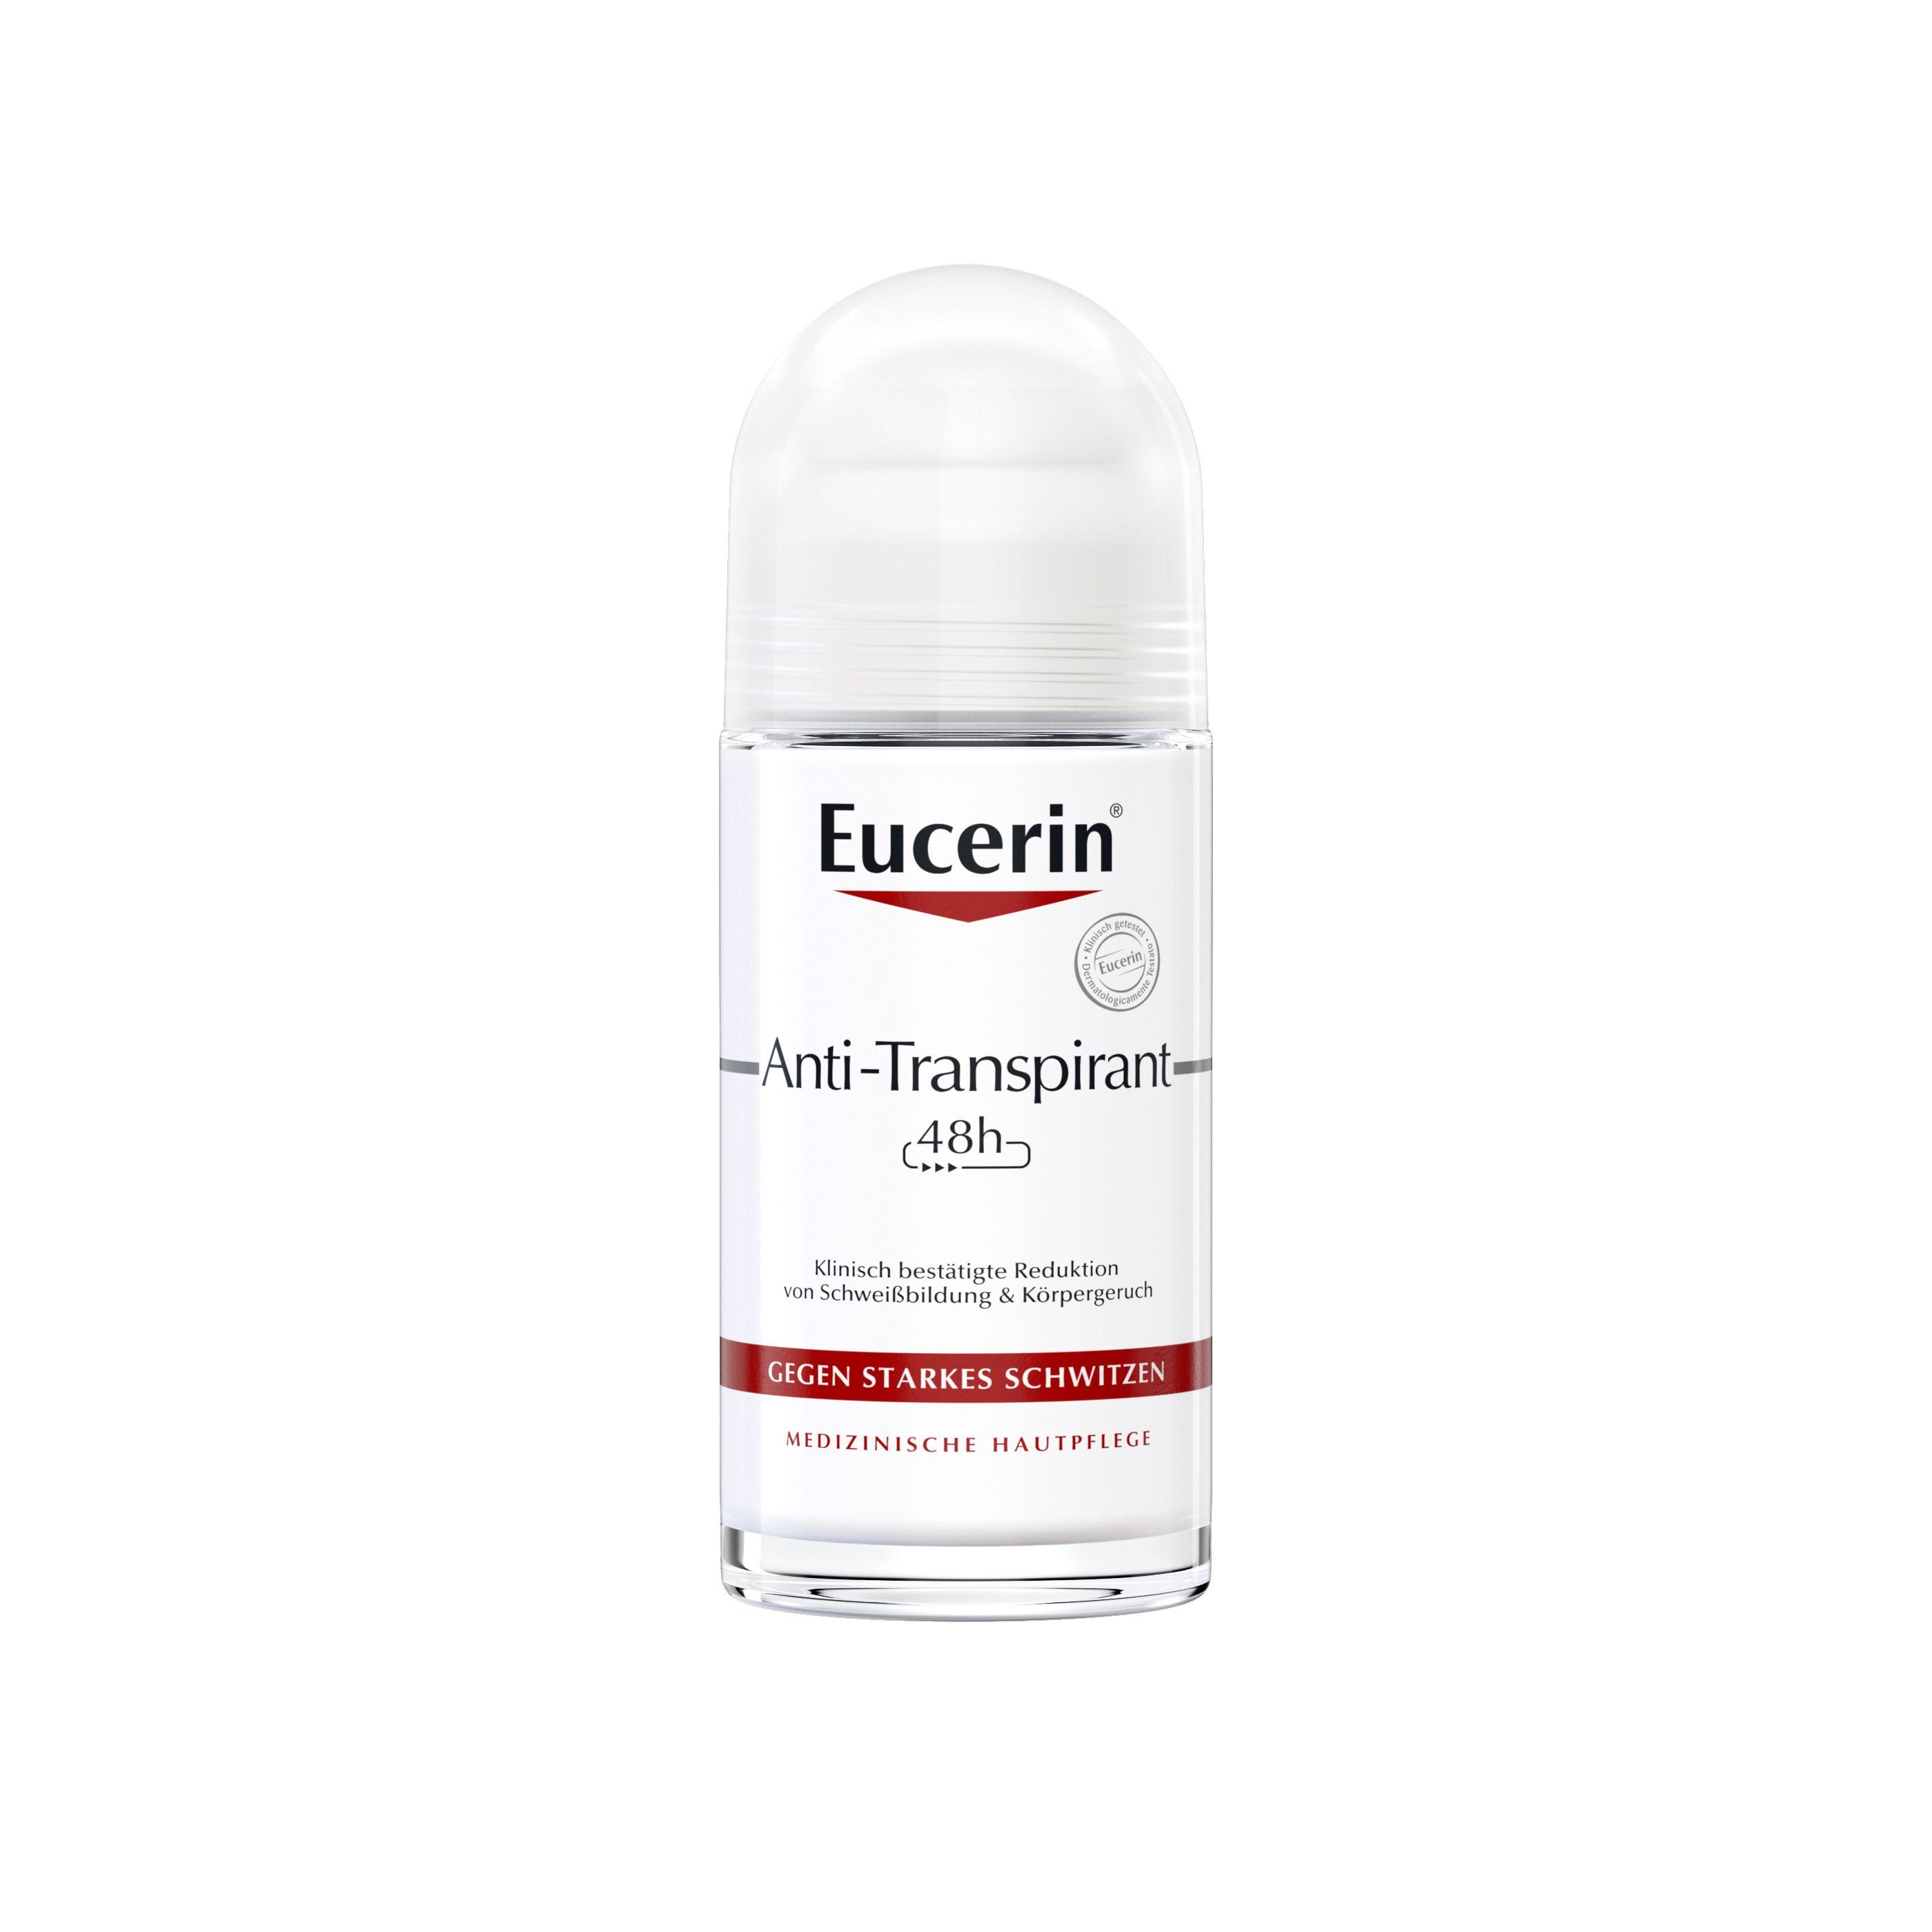 Eucerin® Anti-Transpirant 48h Roll-on